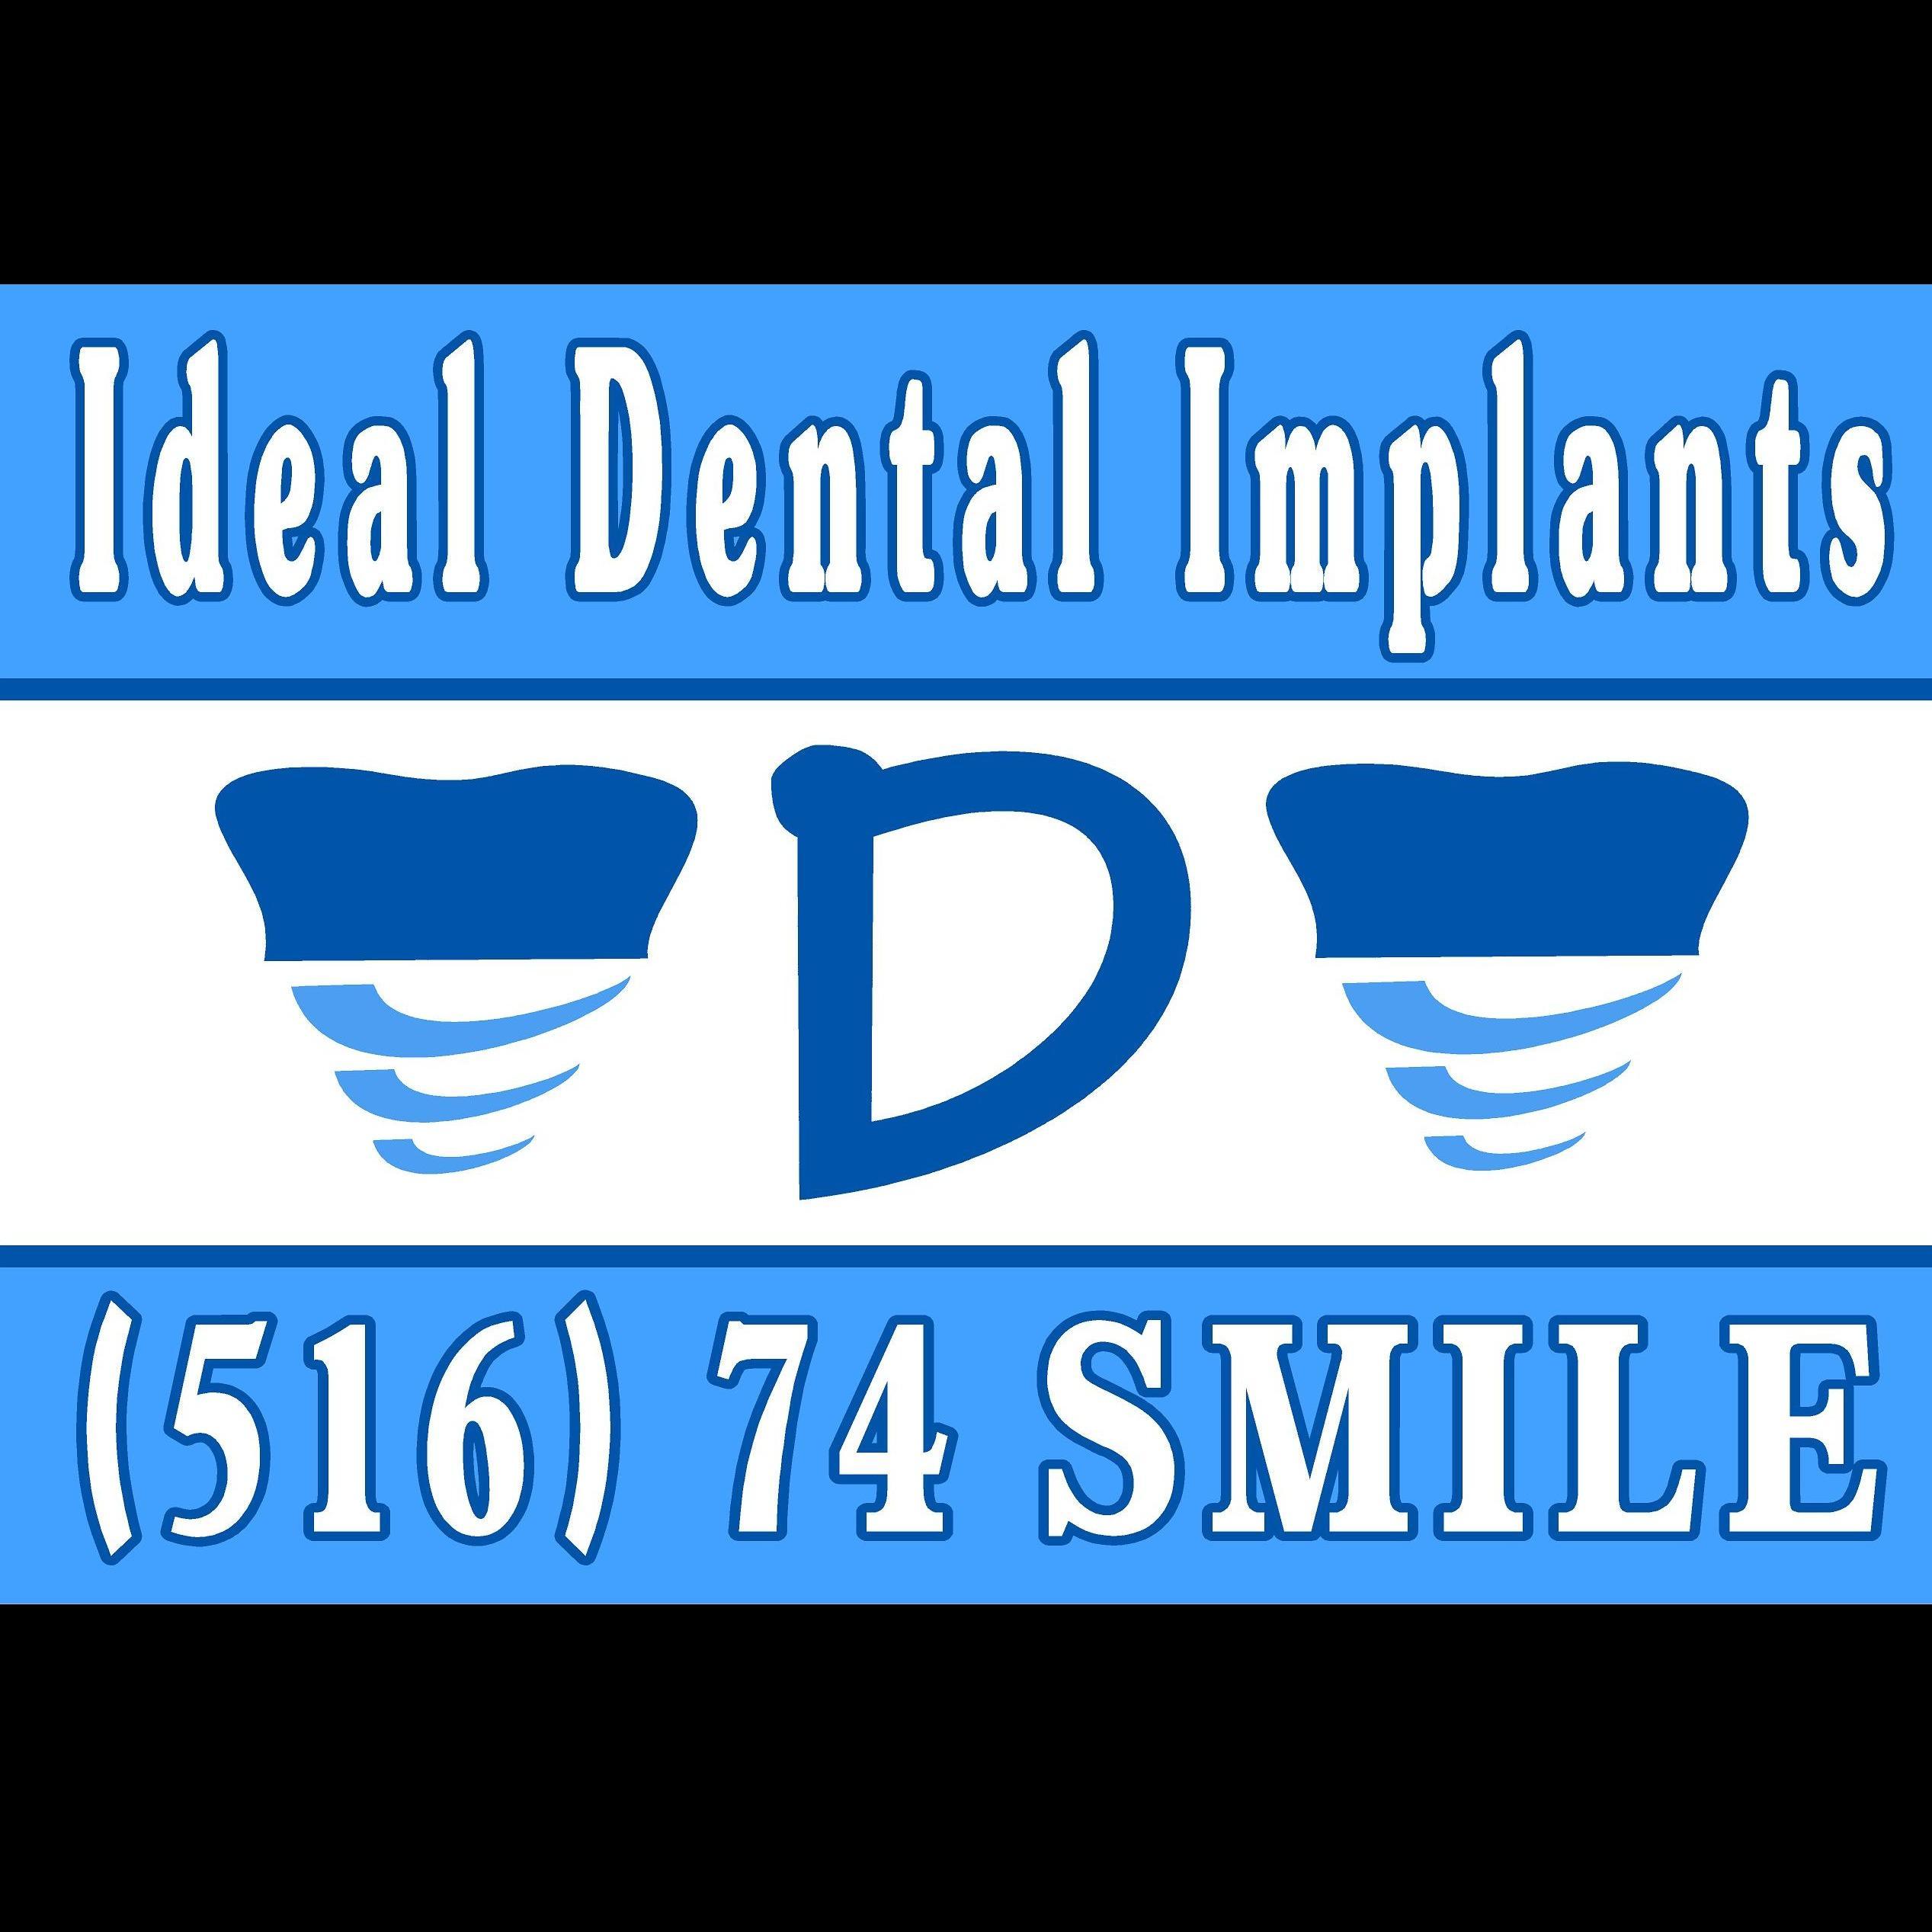 Ideal Dental Implants